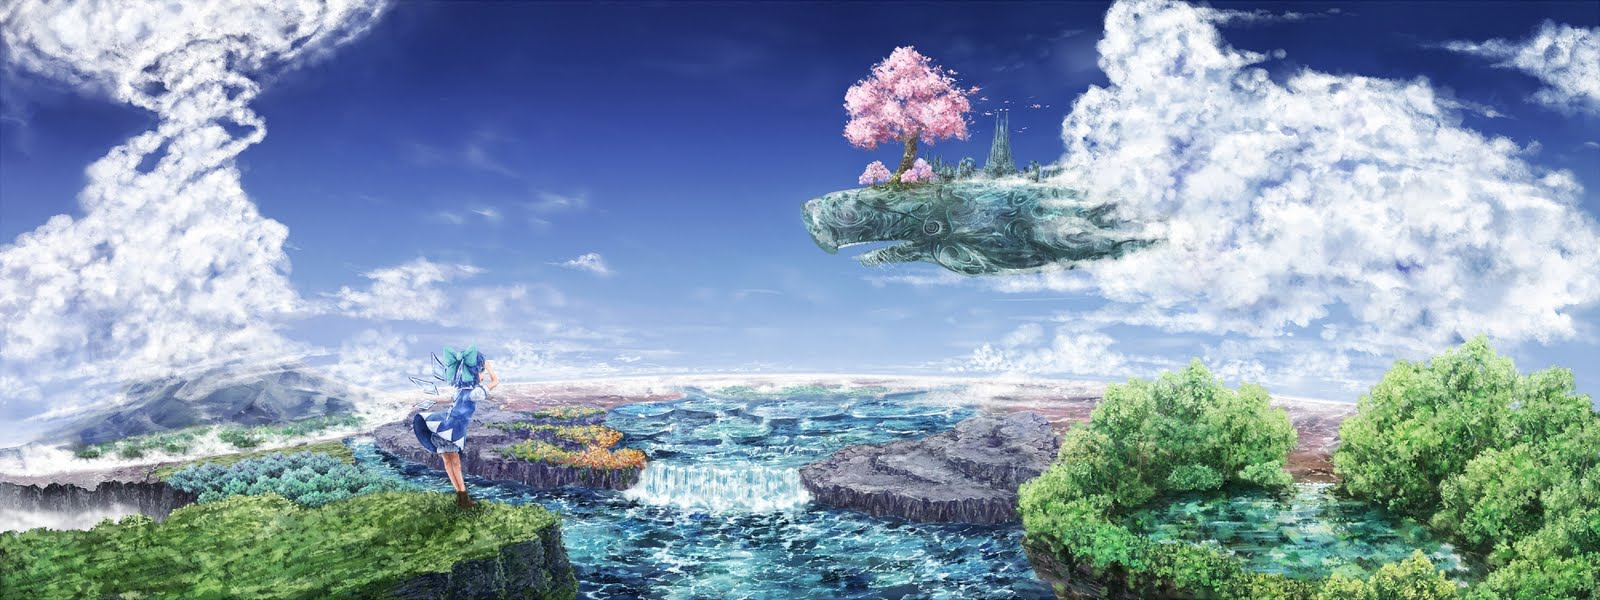 Inuyasha 3d Wallpapers Wallpaper Depot 10 Beautiful Anime Scenery Wallpapers